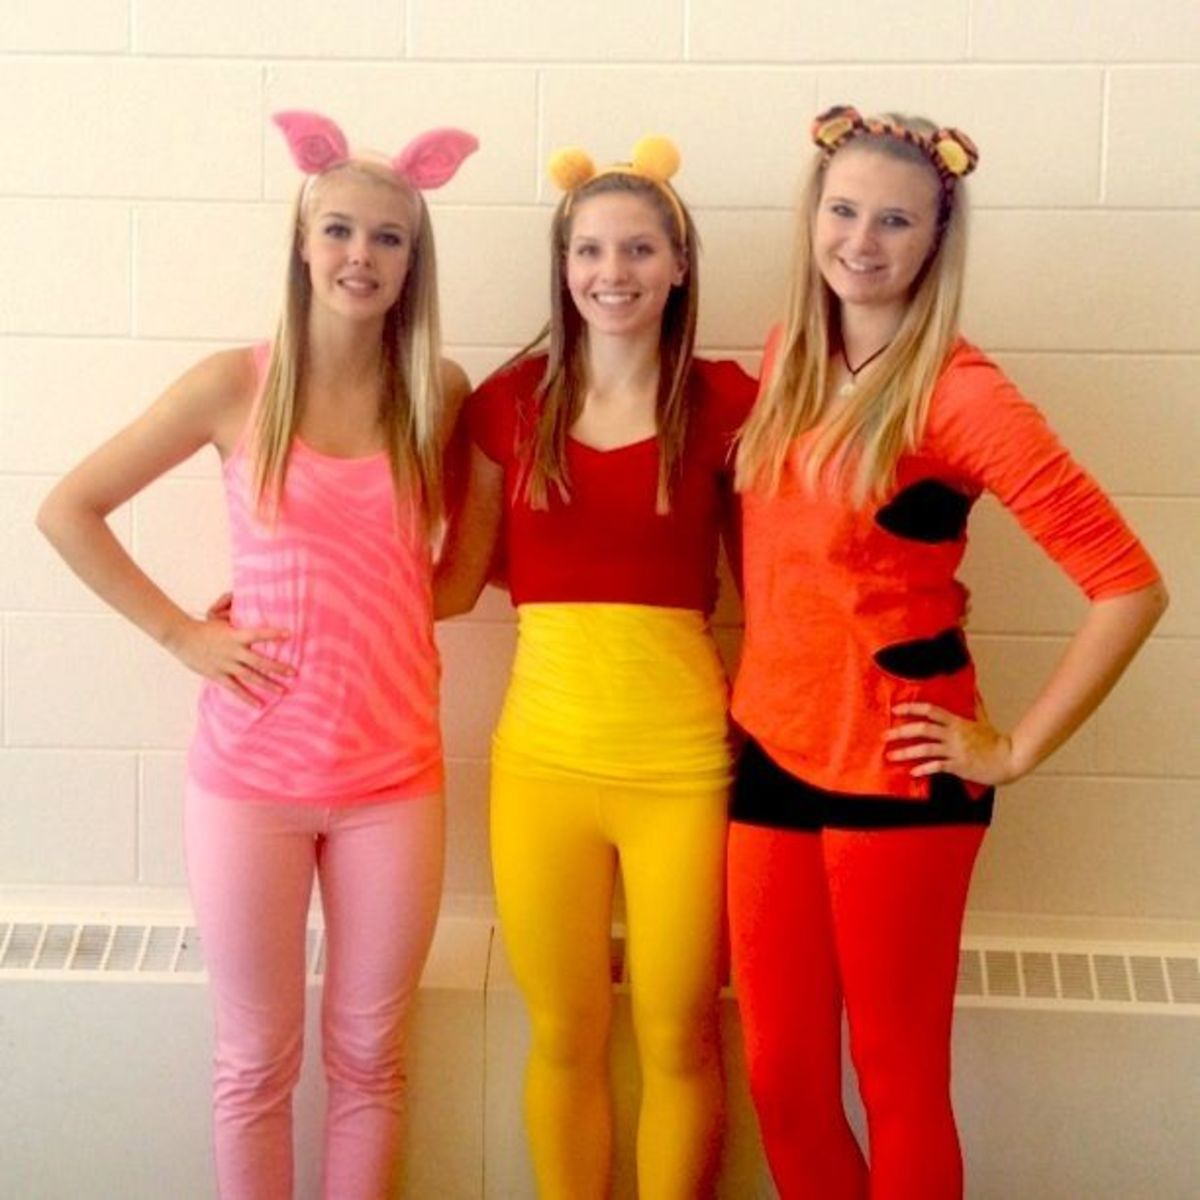 Winnie the Pooh Babes